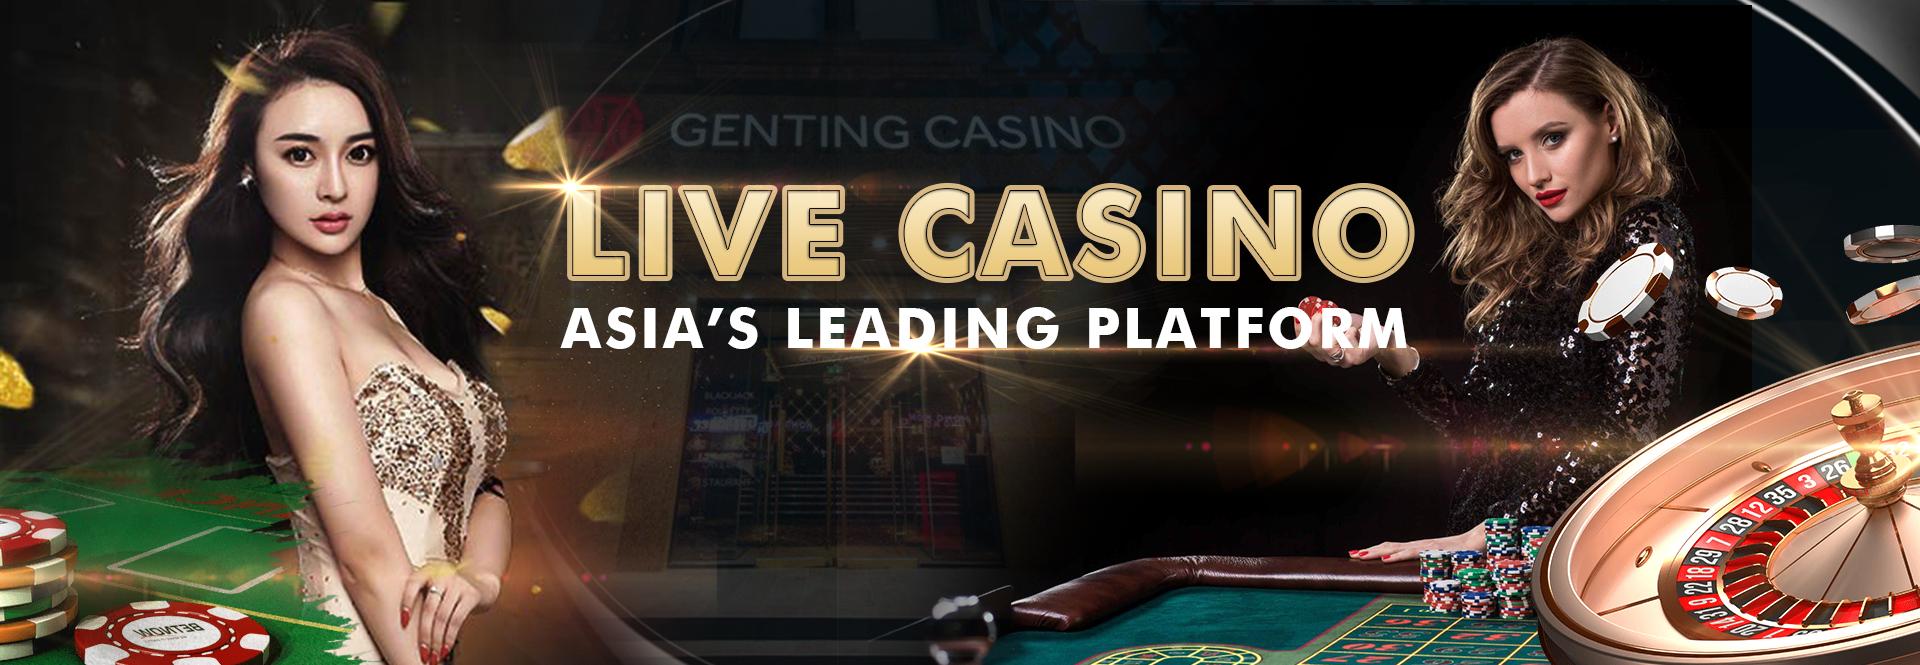 Live Casino , Leocity88, LPE , Newton ,GW99 ,baccarat , roulette - Singapore - Malaysia